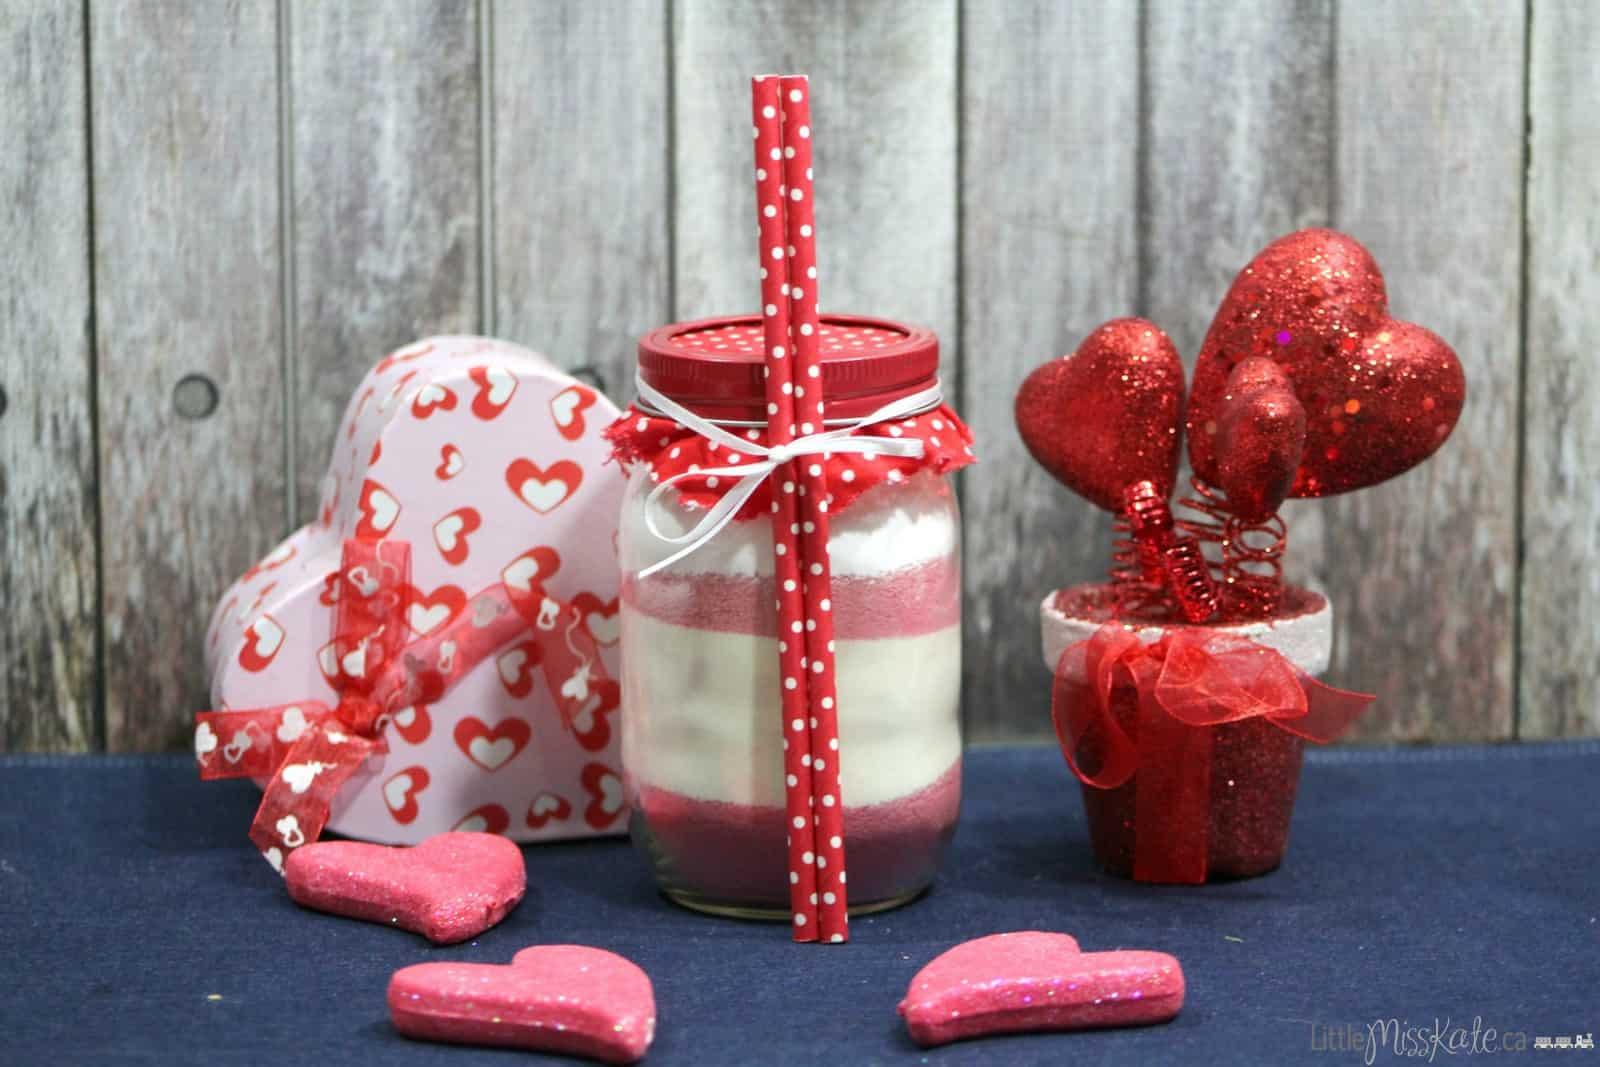 DIY Mason Jar Gift Idea – Hot Strawberry Drink Mix